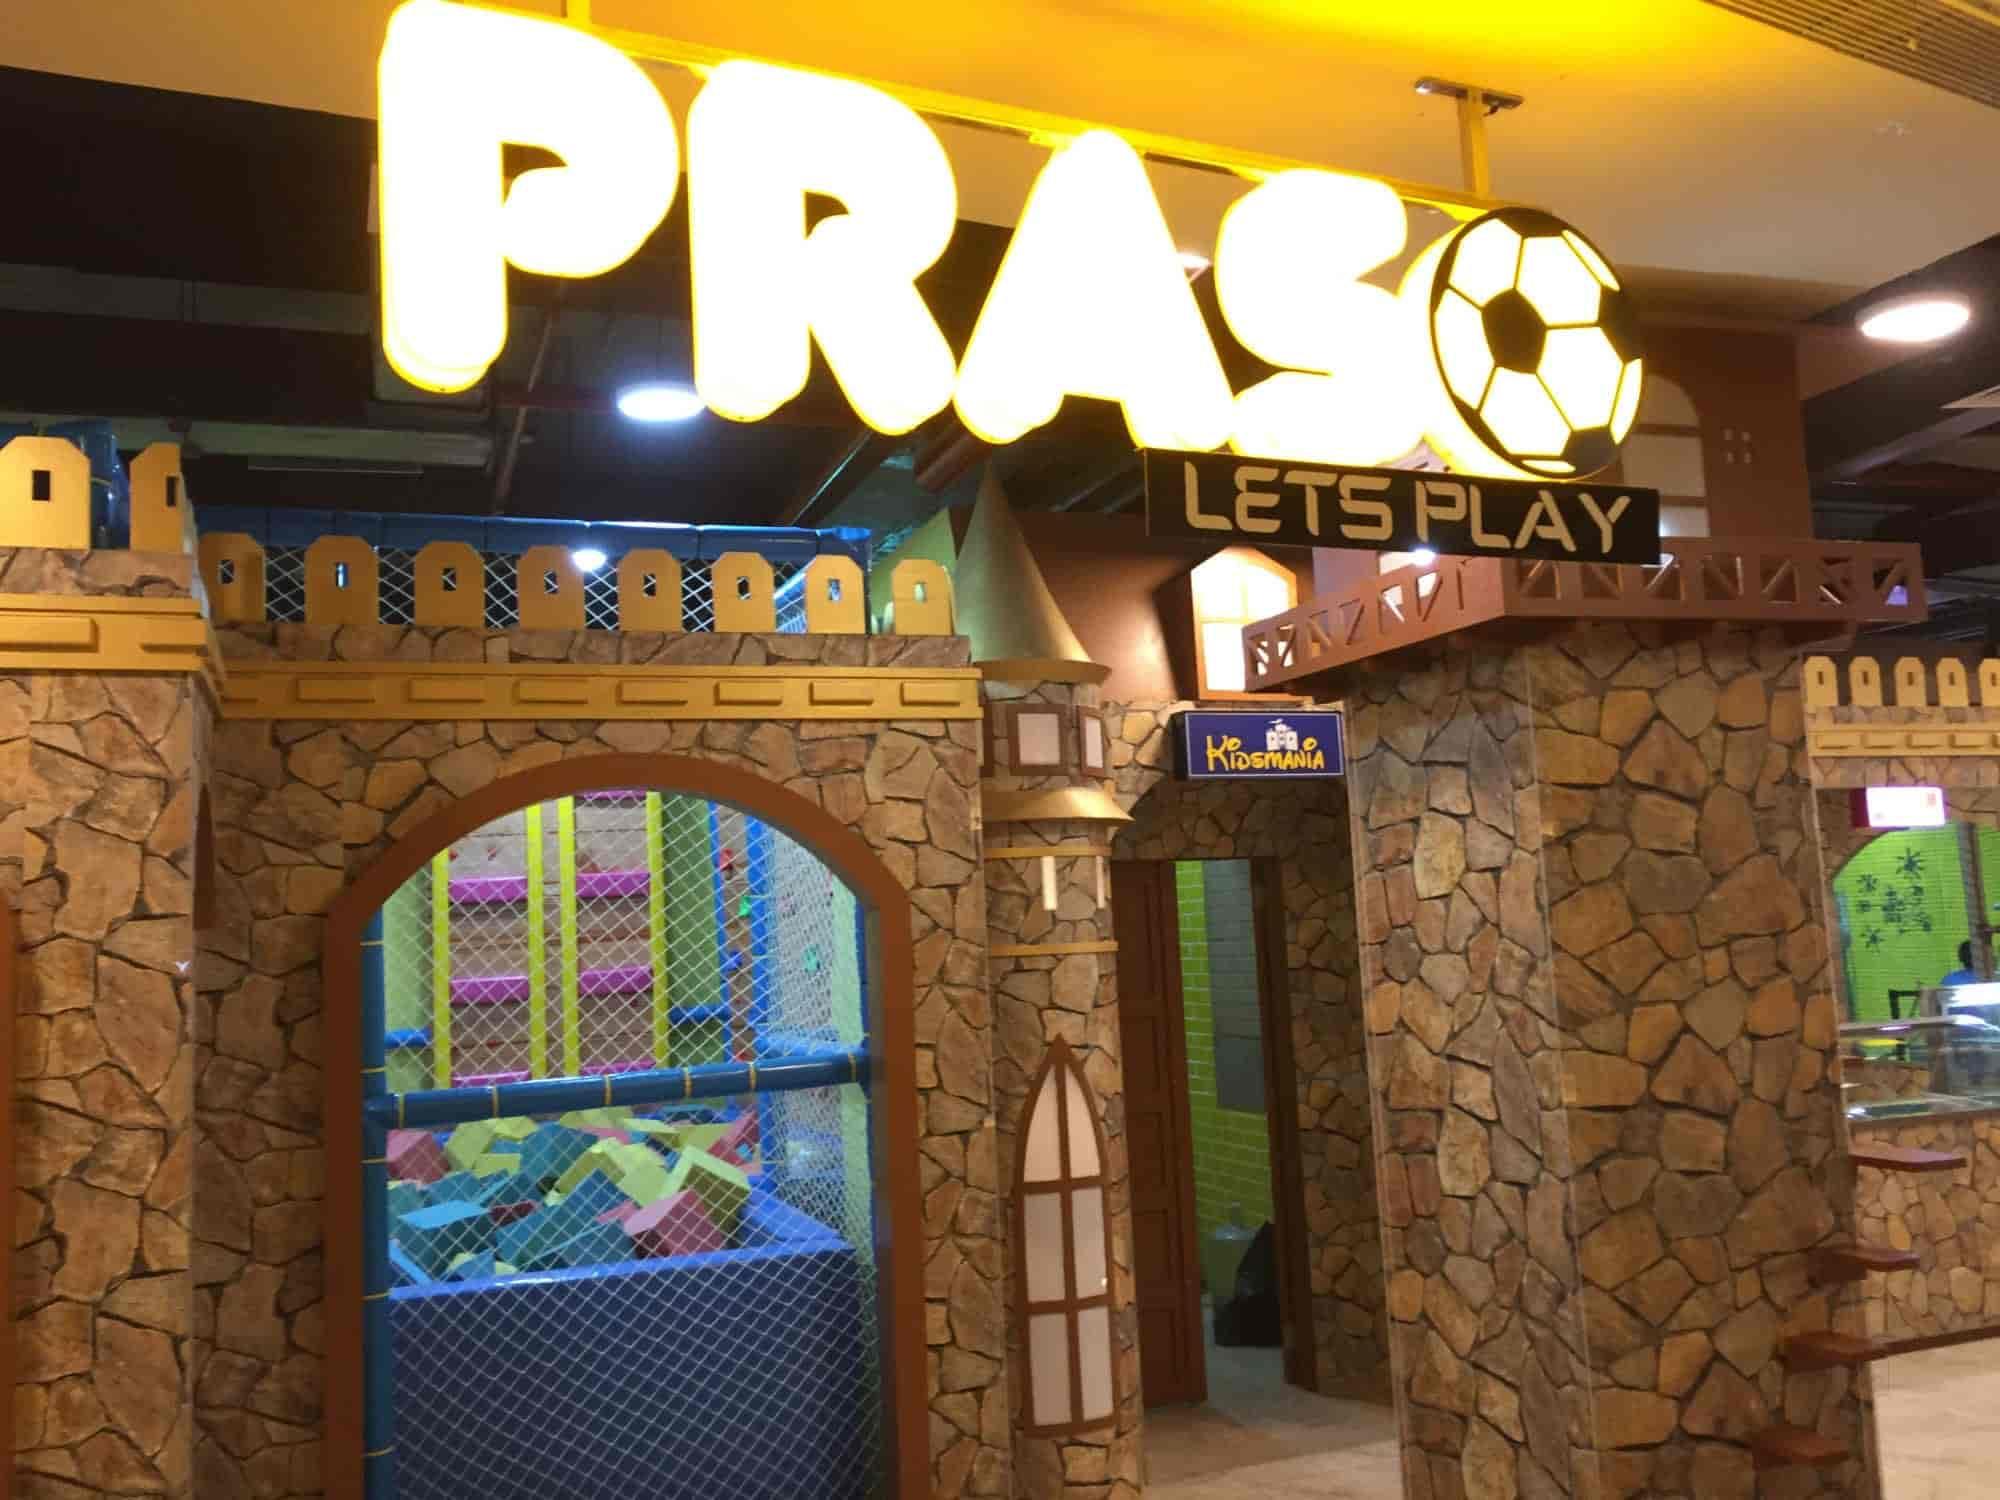 Praso Lets Play Dumas Road Gaming Zones In Surat Justdial